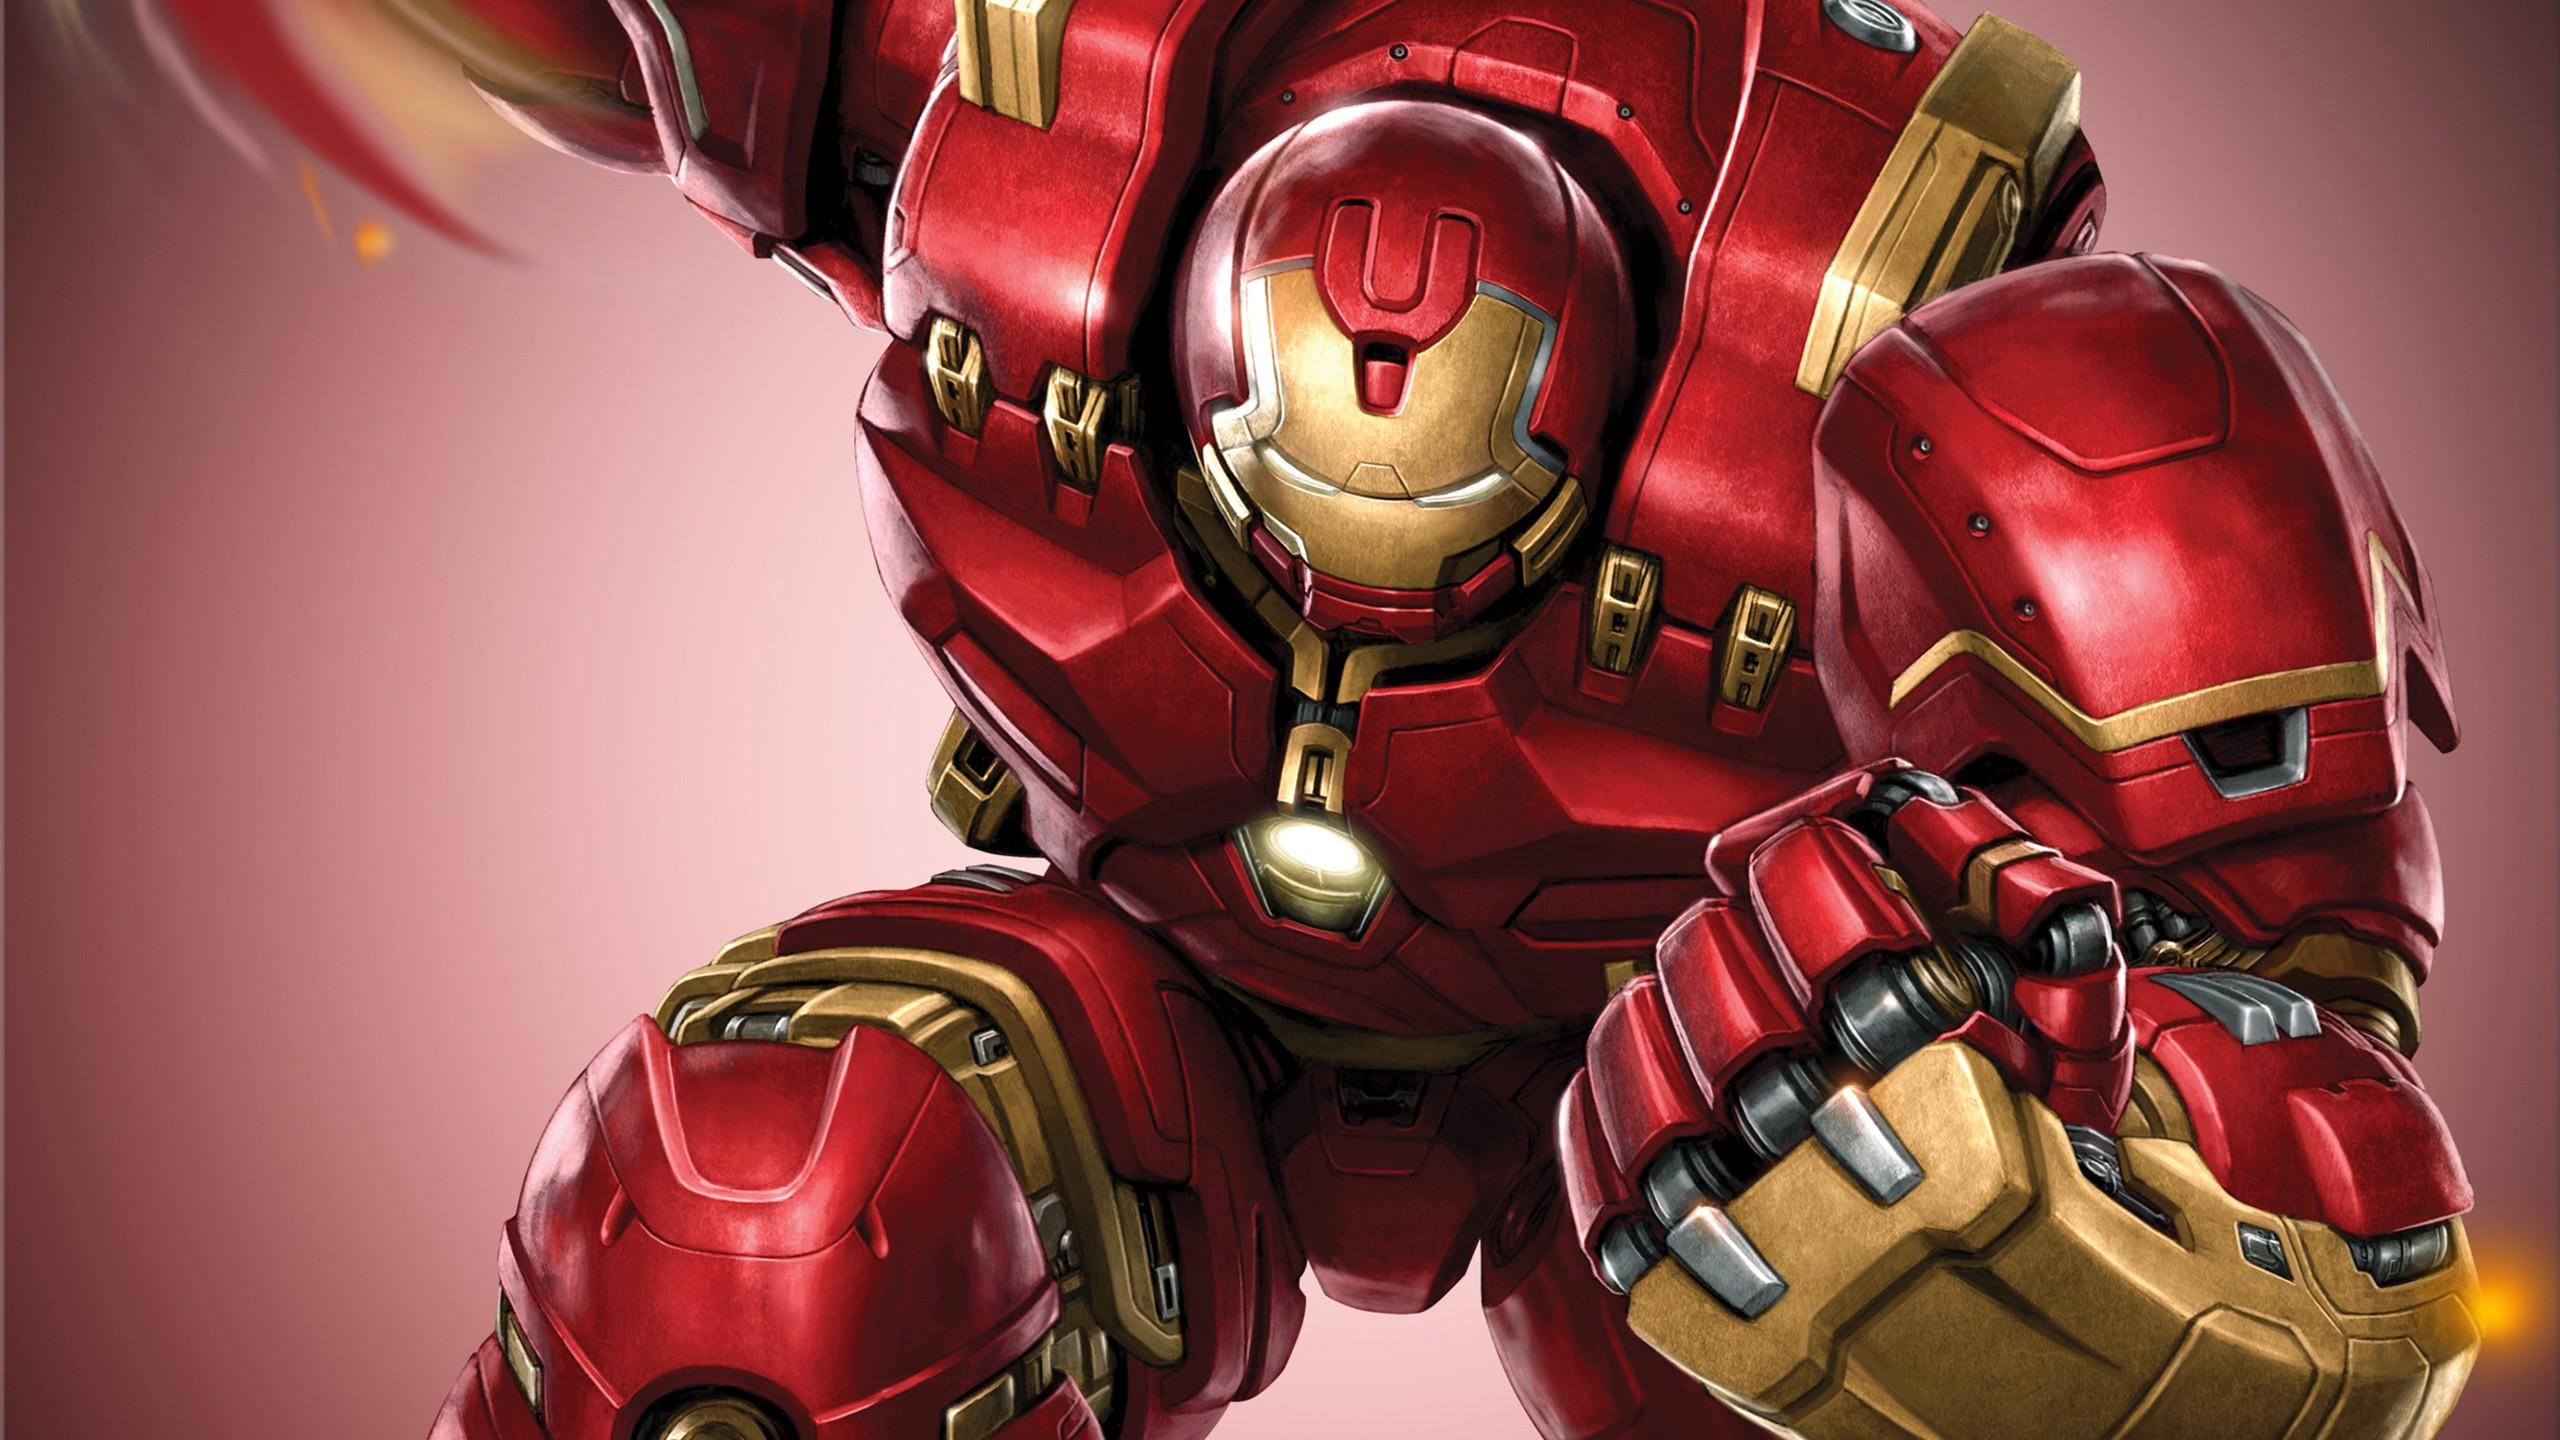 Hulk 3d Wallpaper Download Iron Man Hulk Armor Wallpapers Hd Wallpapers Id 26632